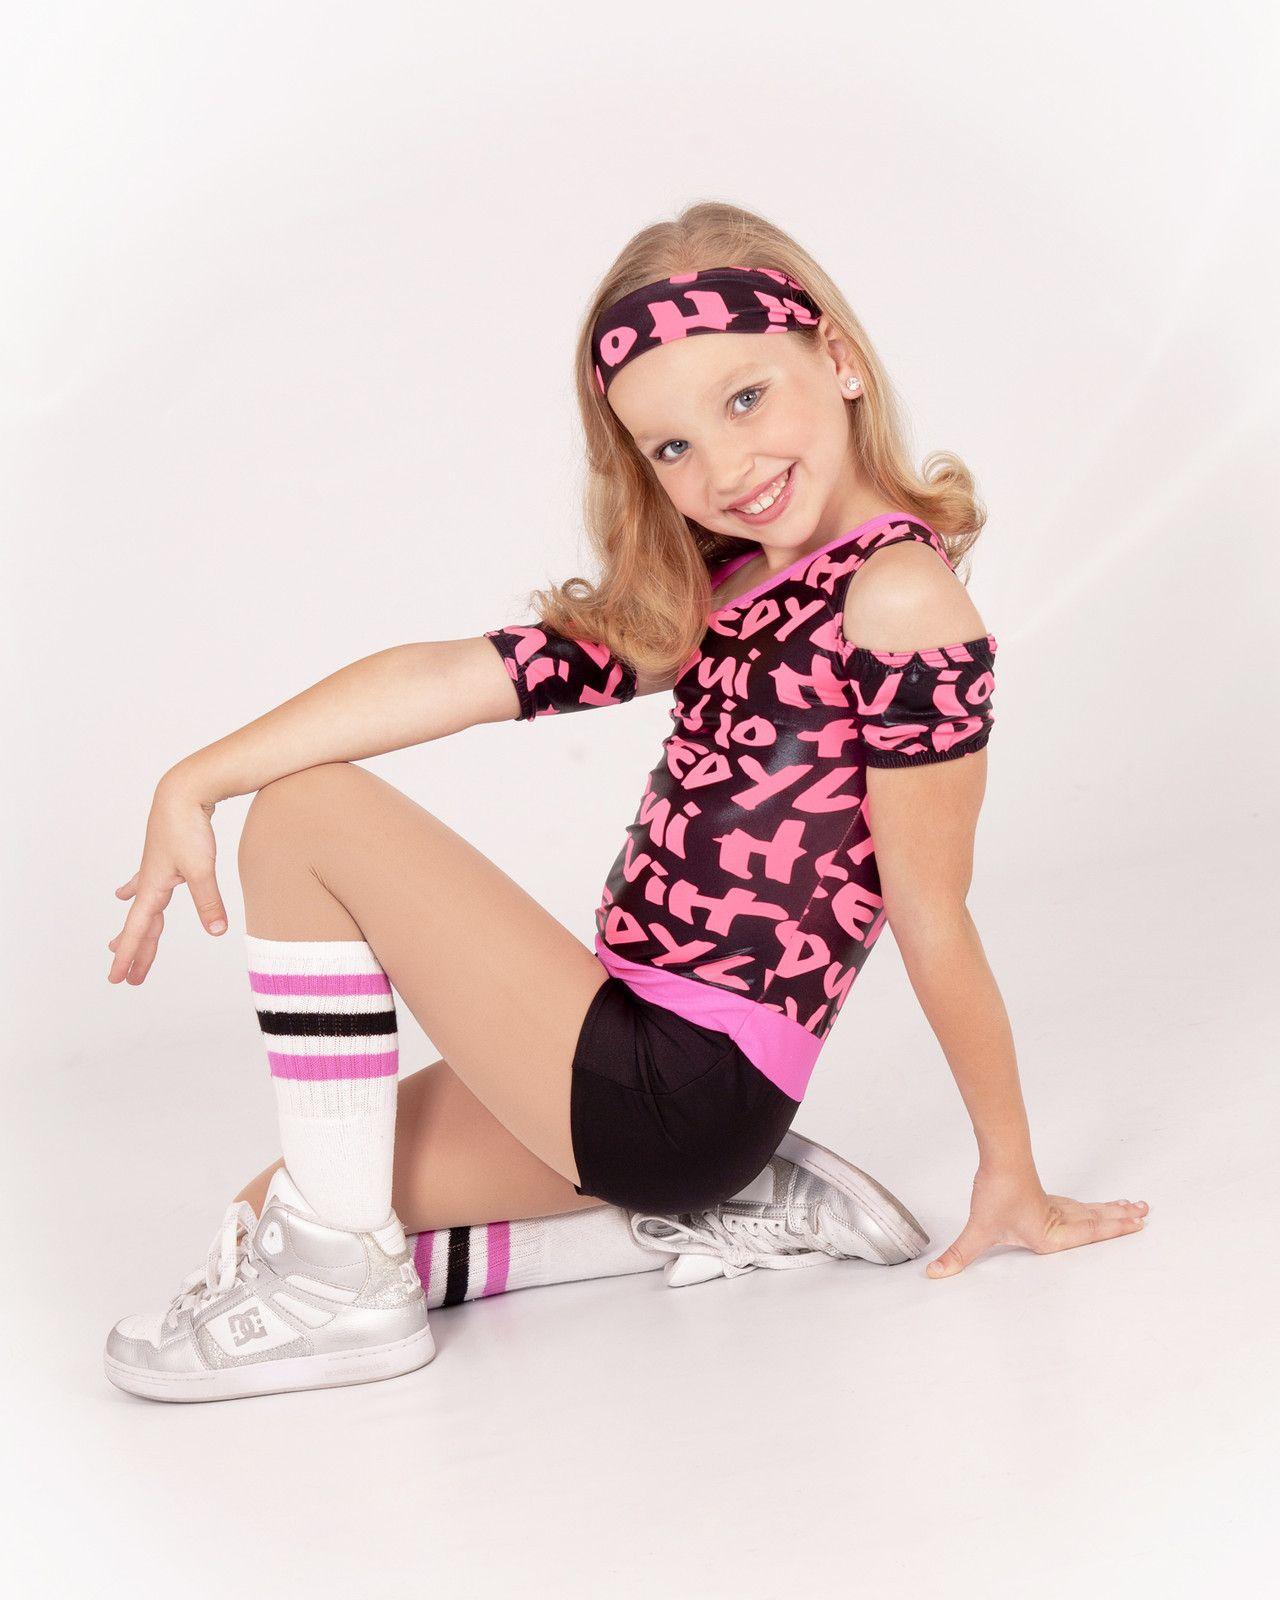 Jazz Hip Hop Dance Costume Pink and Black | eBay | Dance | Pinterest ...